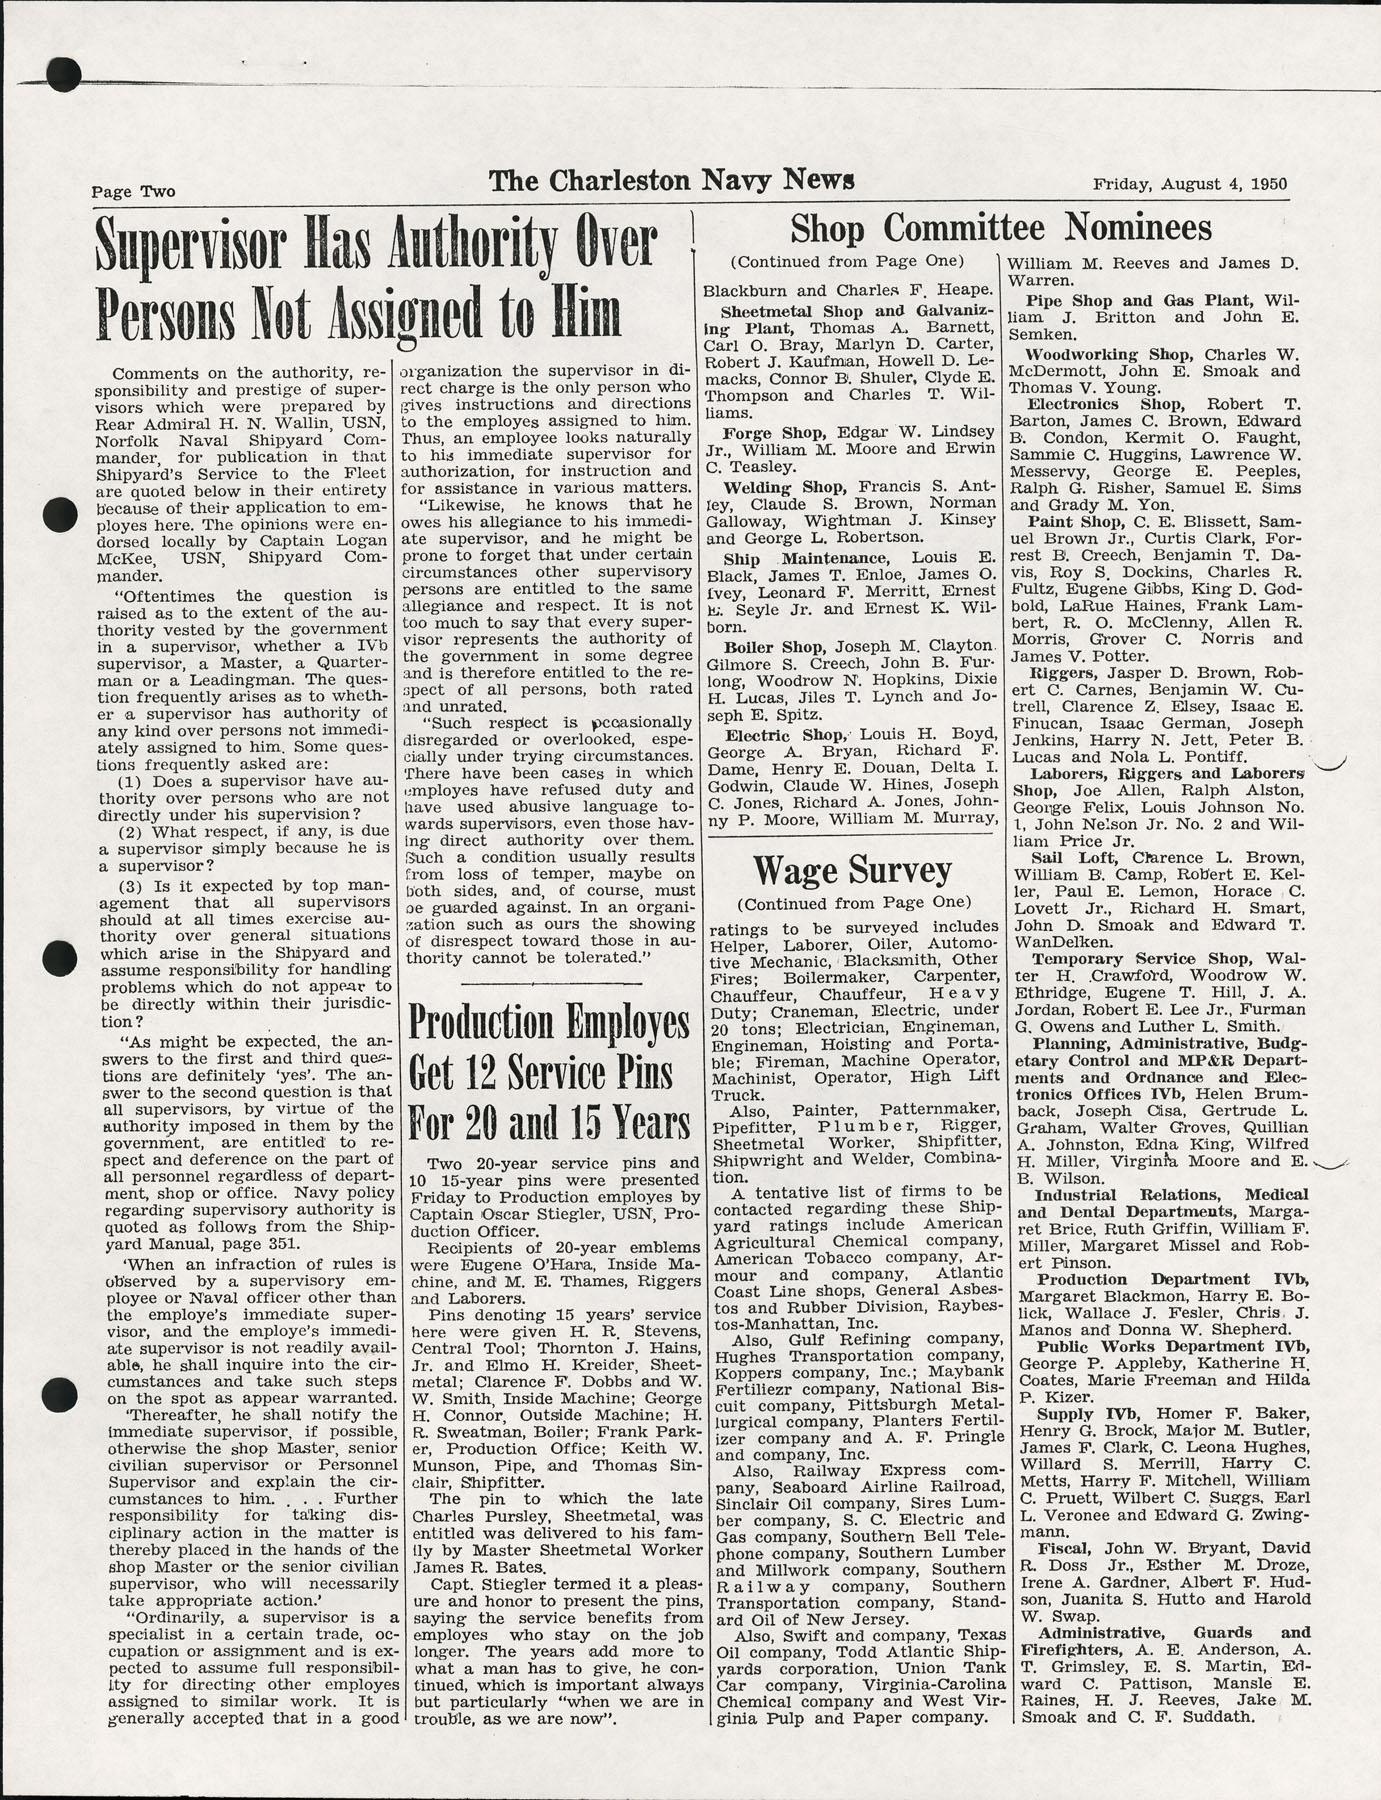 The Charleston Navy News, Volume 9, Edition 1, page ii